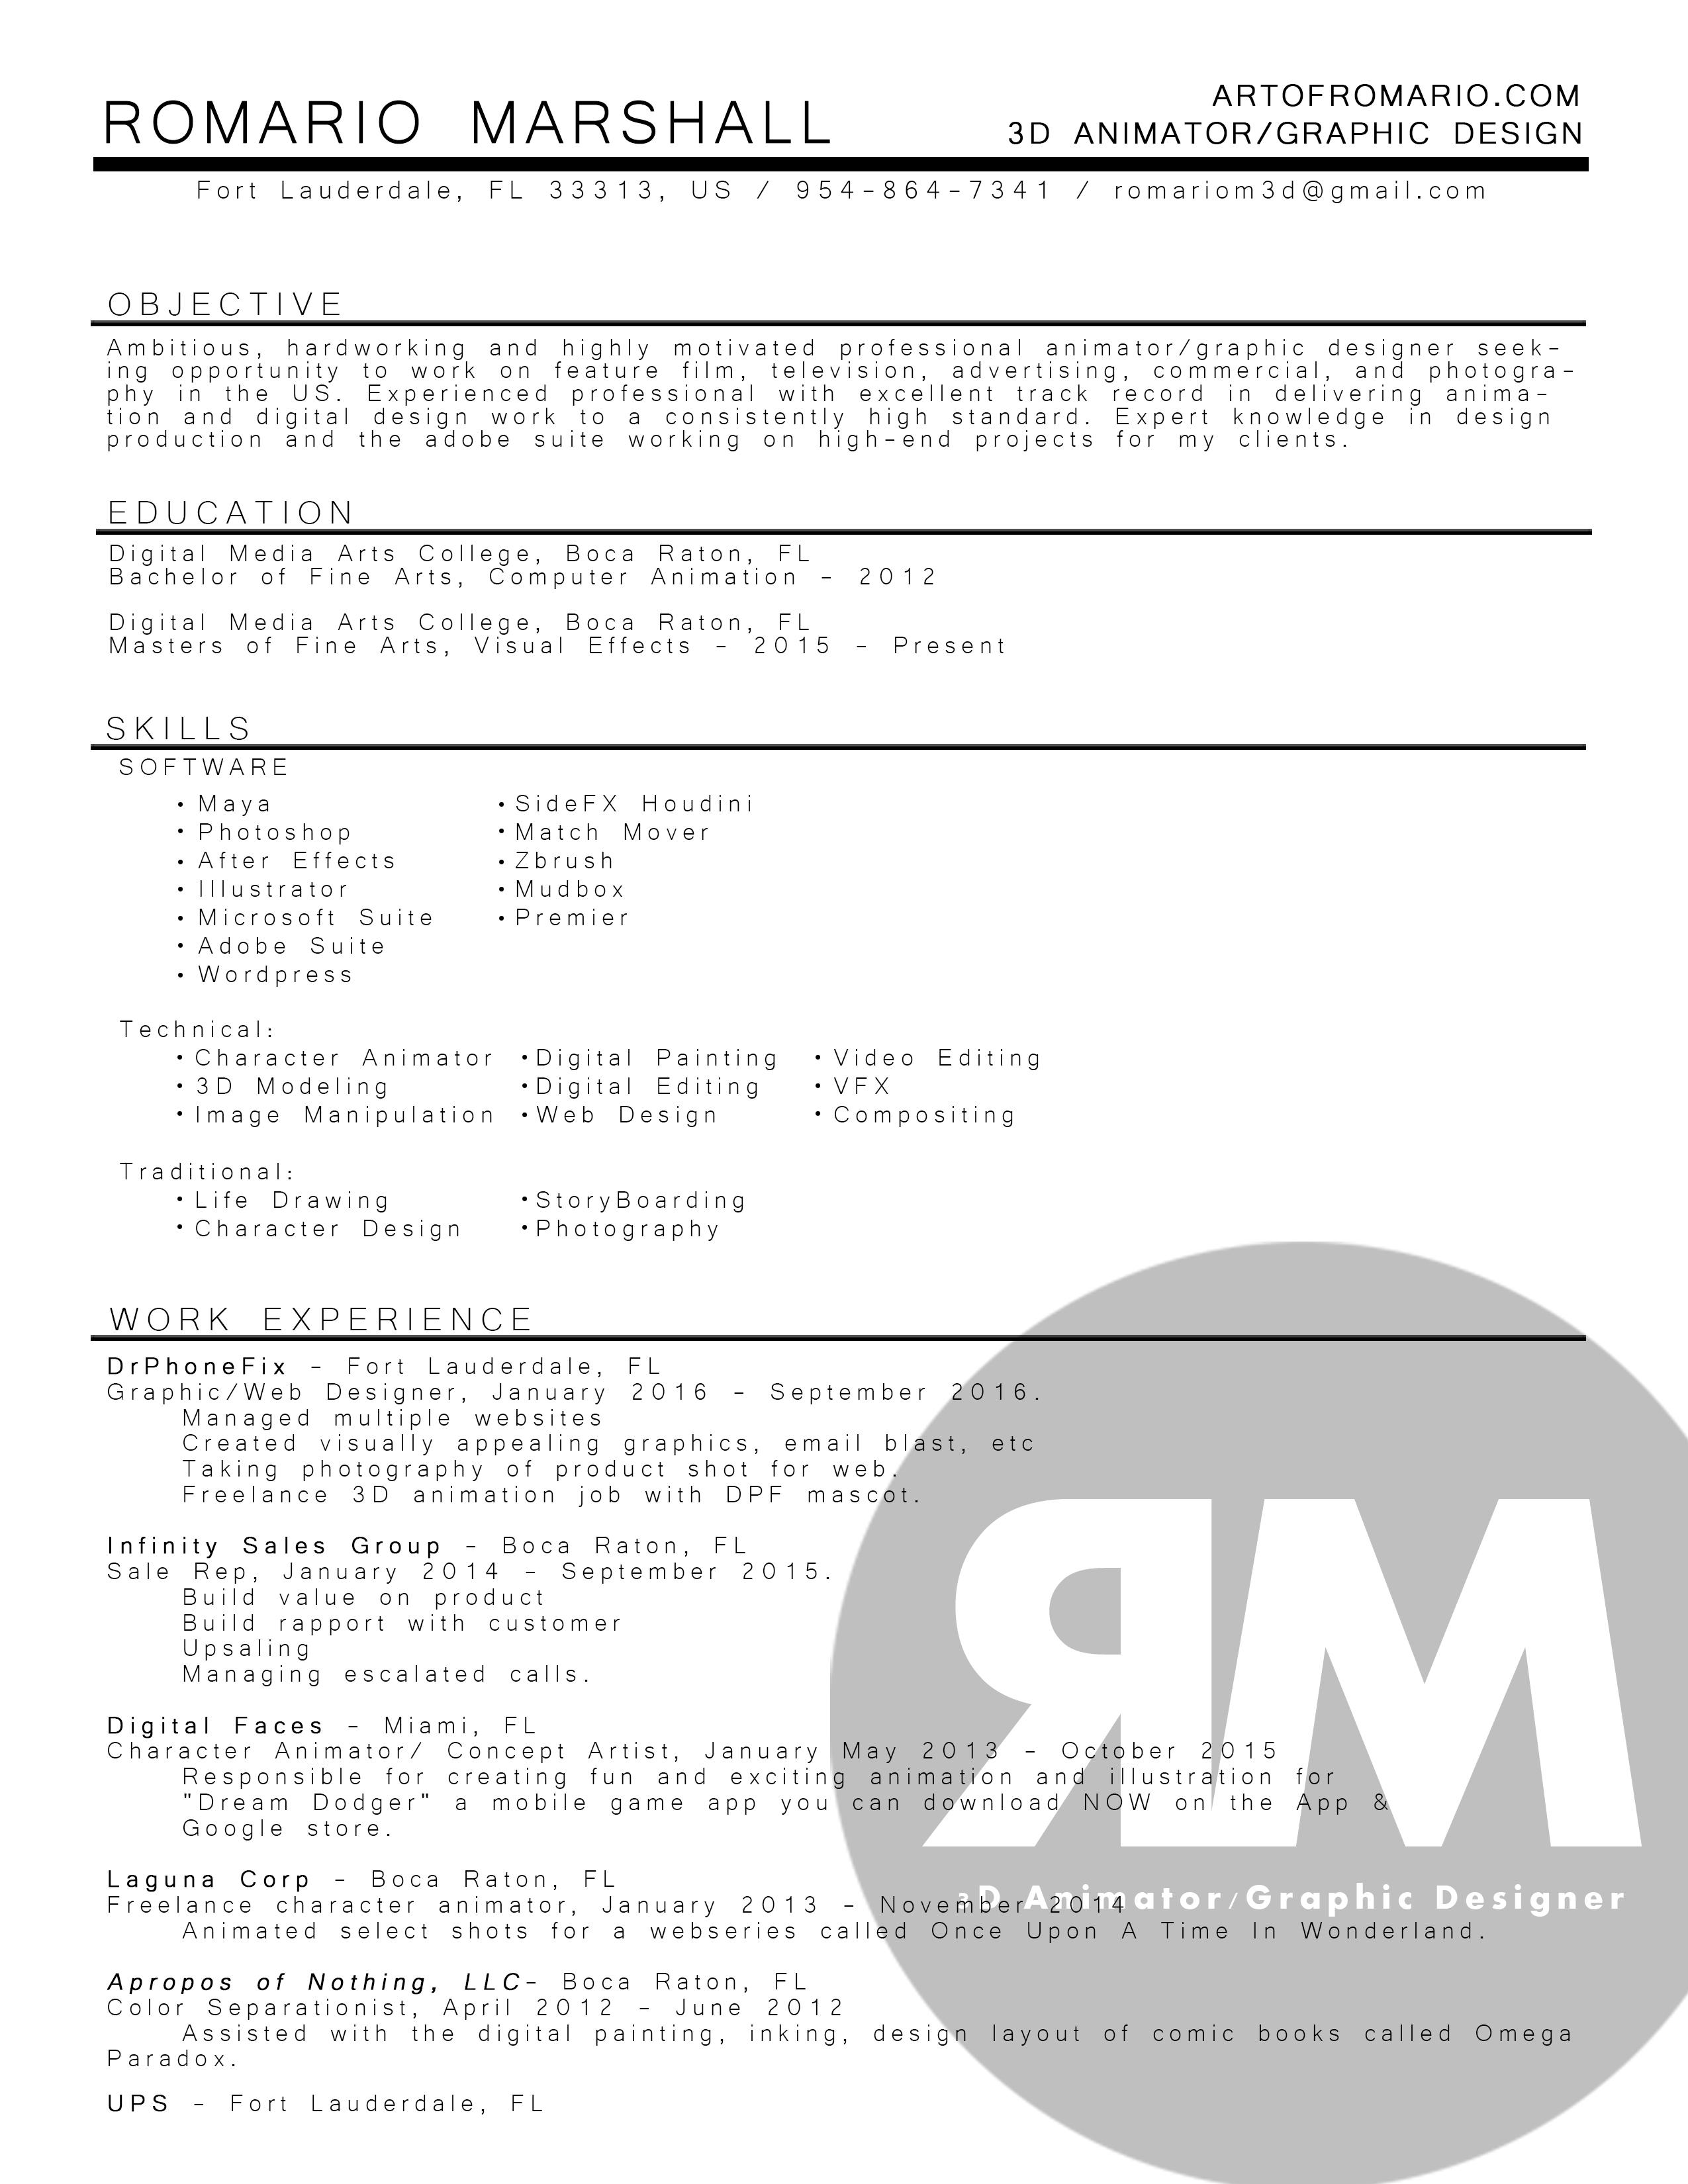 romario-marshall-resume-2016